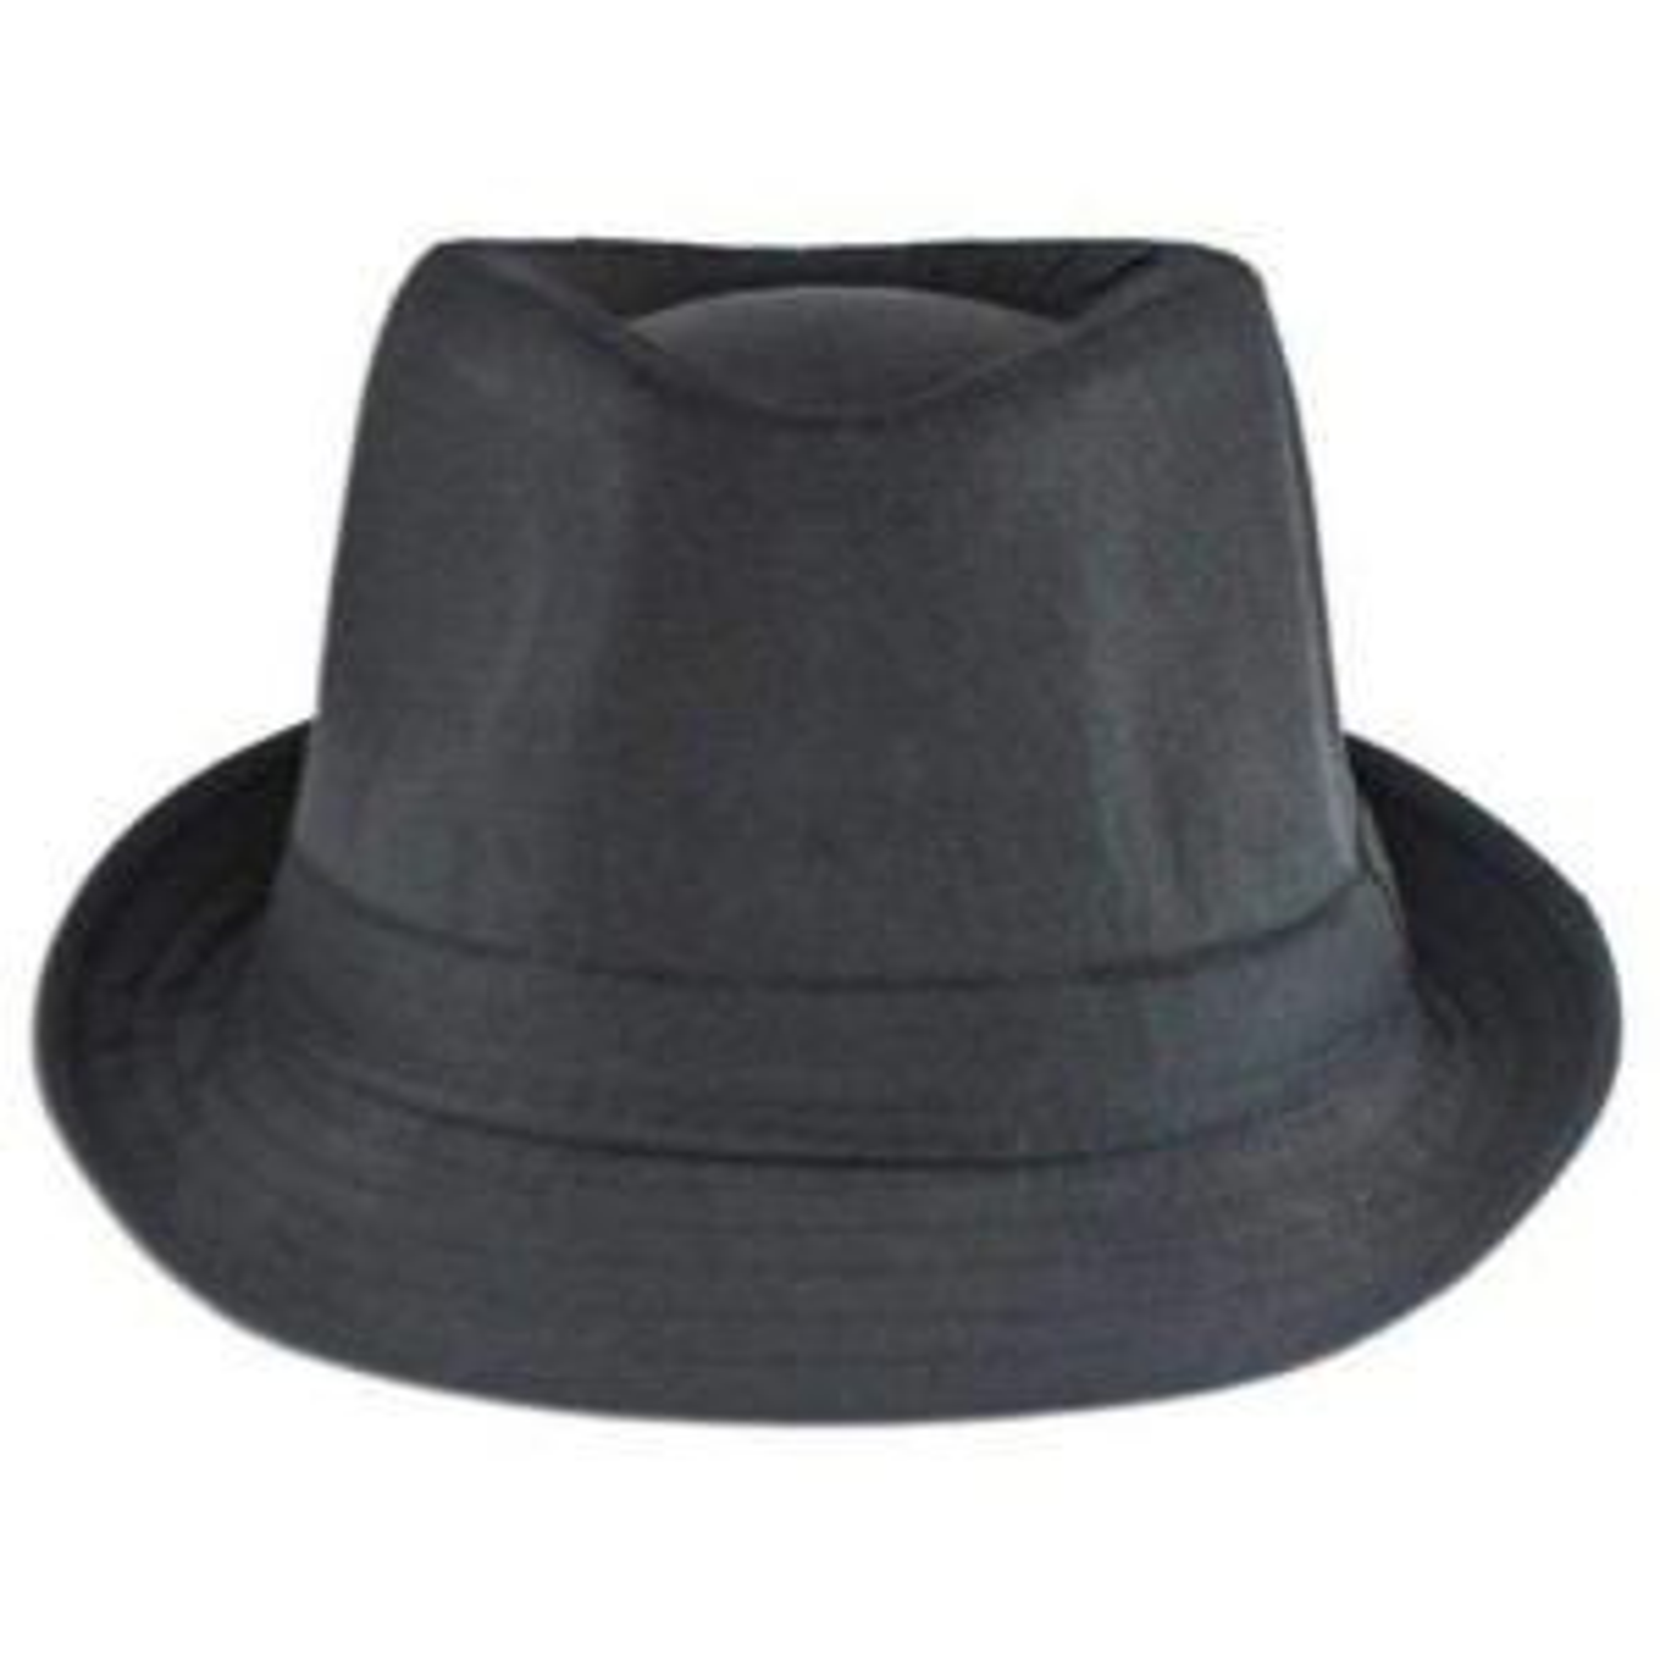 کلاه شاپو بچگانه مدل 88